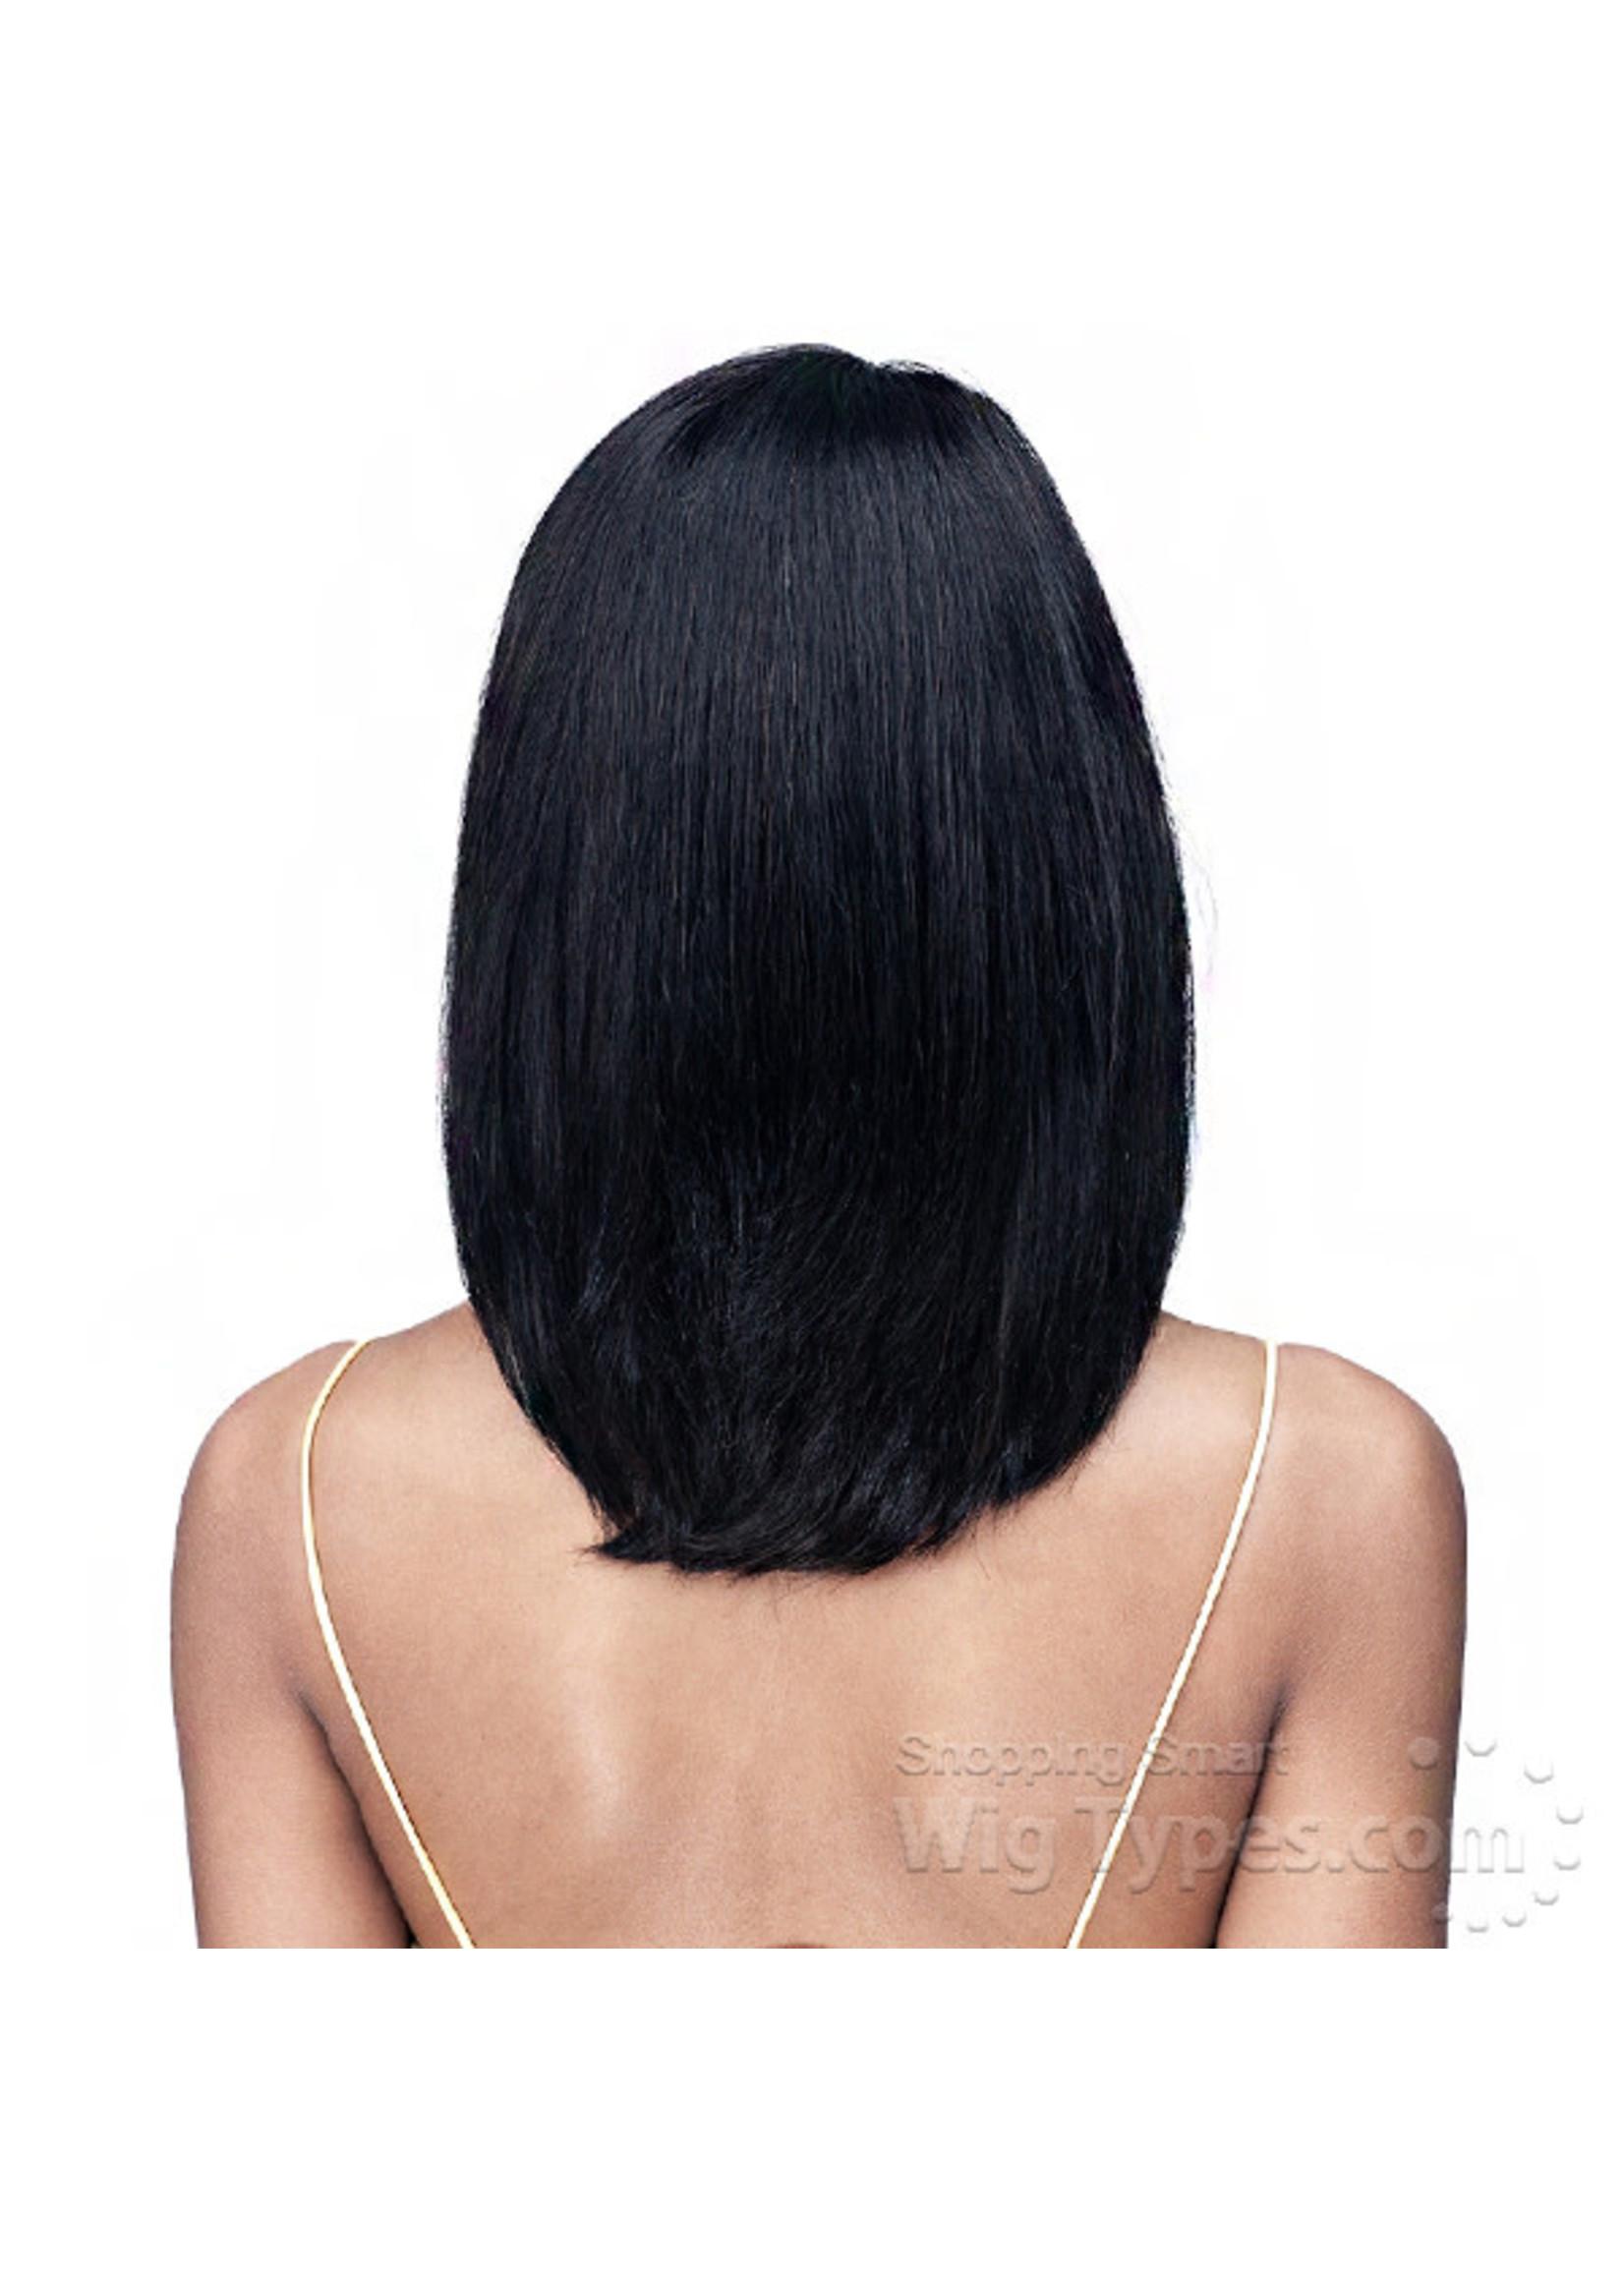 Bobbi Boss Boss Lace HH Wig- Logan